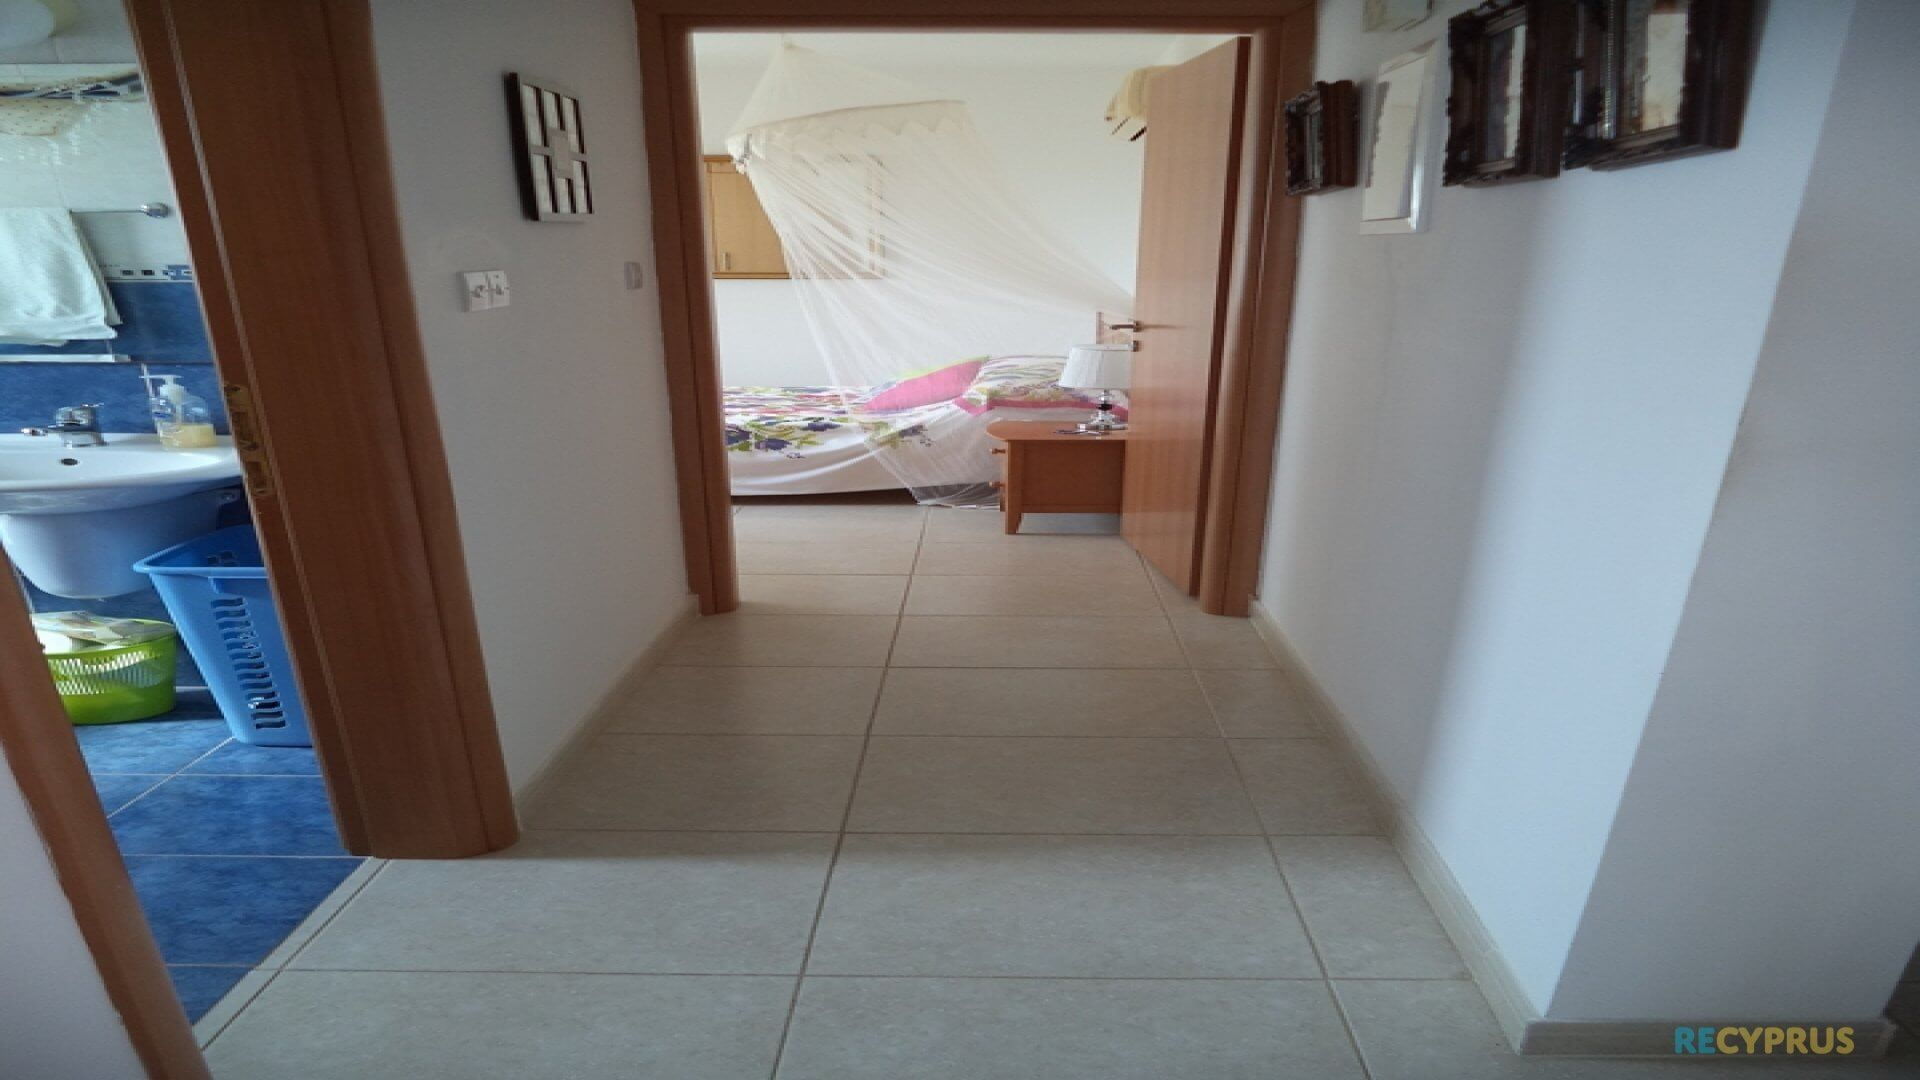 Apartment for sale Kapparis Famagusta Cyprus 7 3463